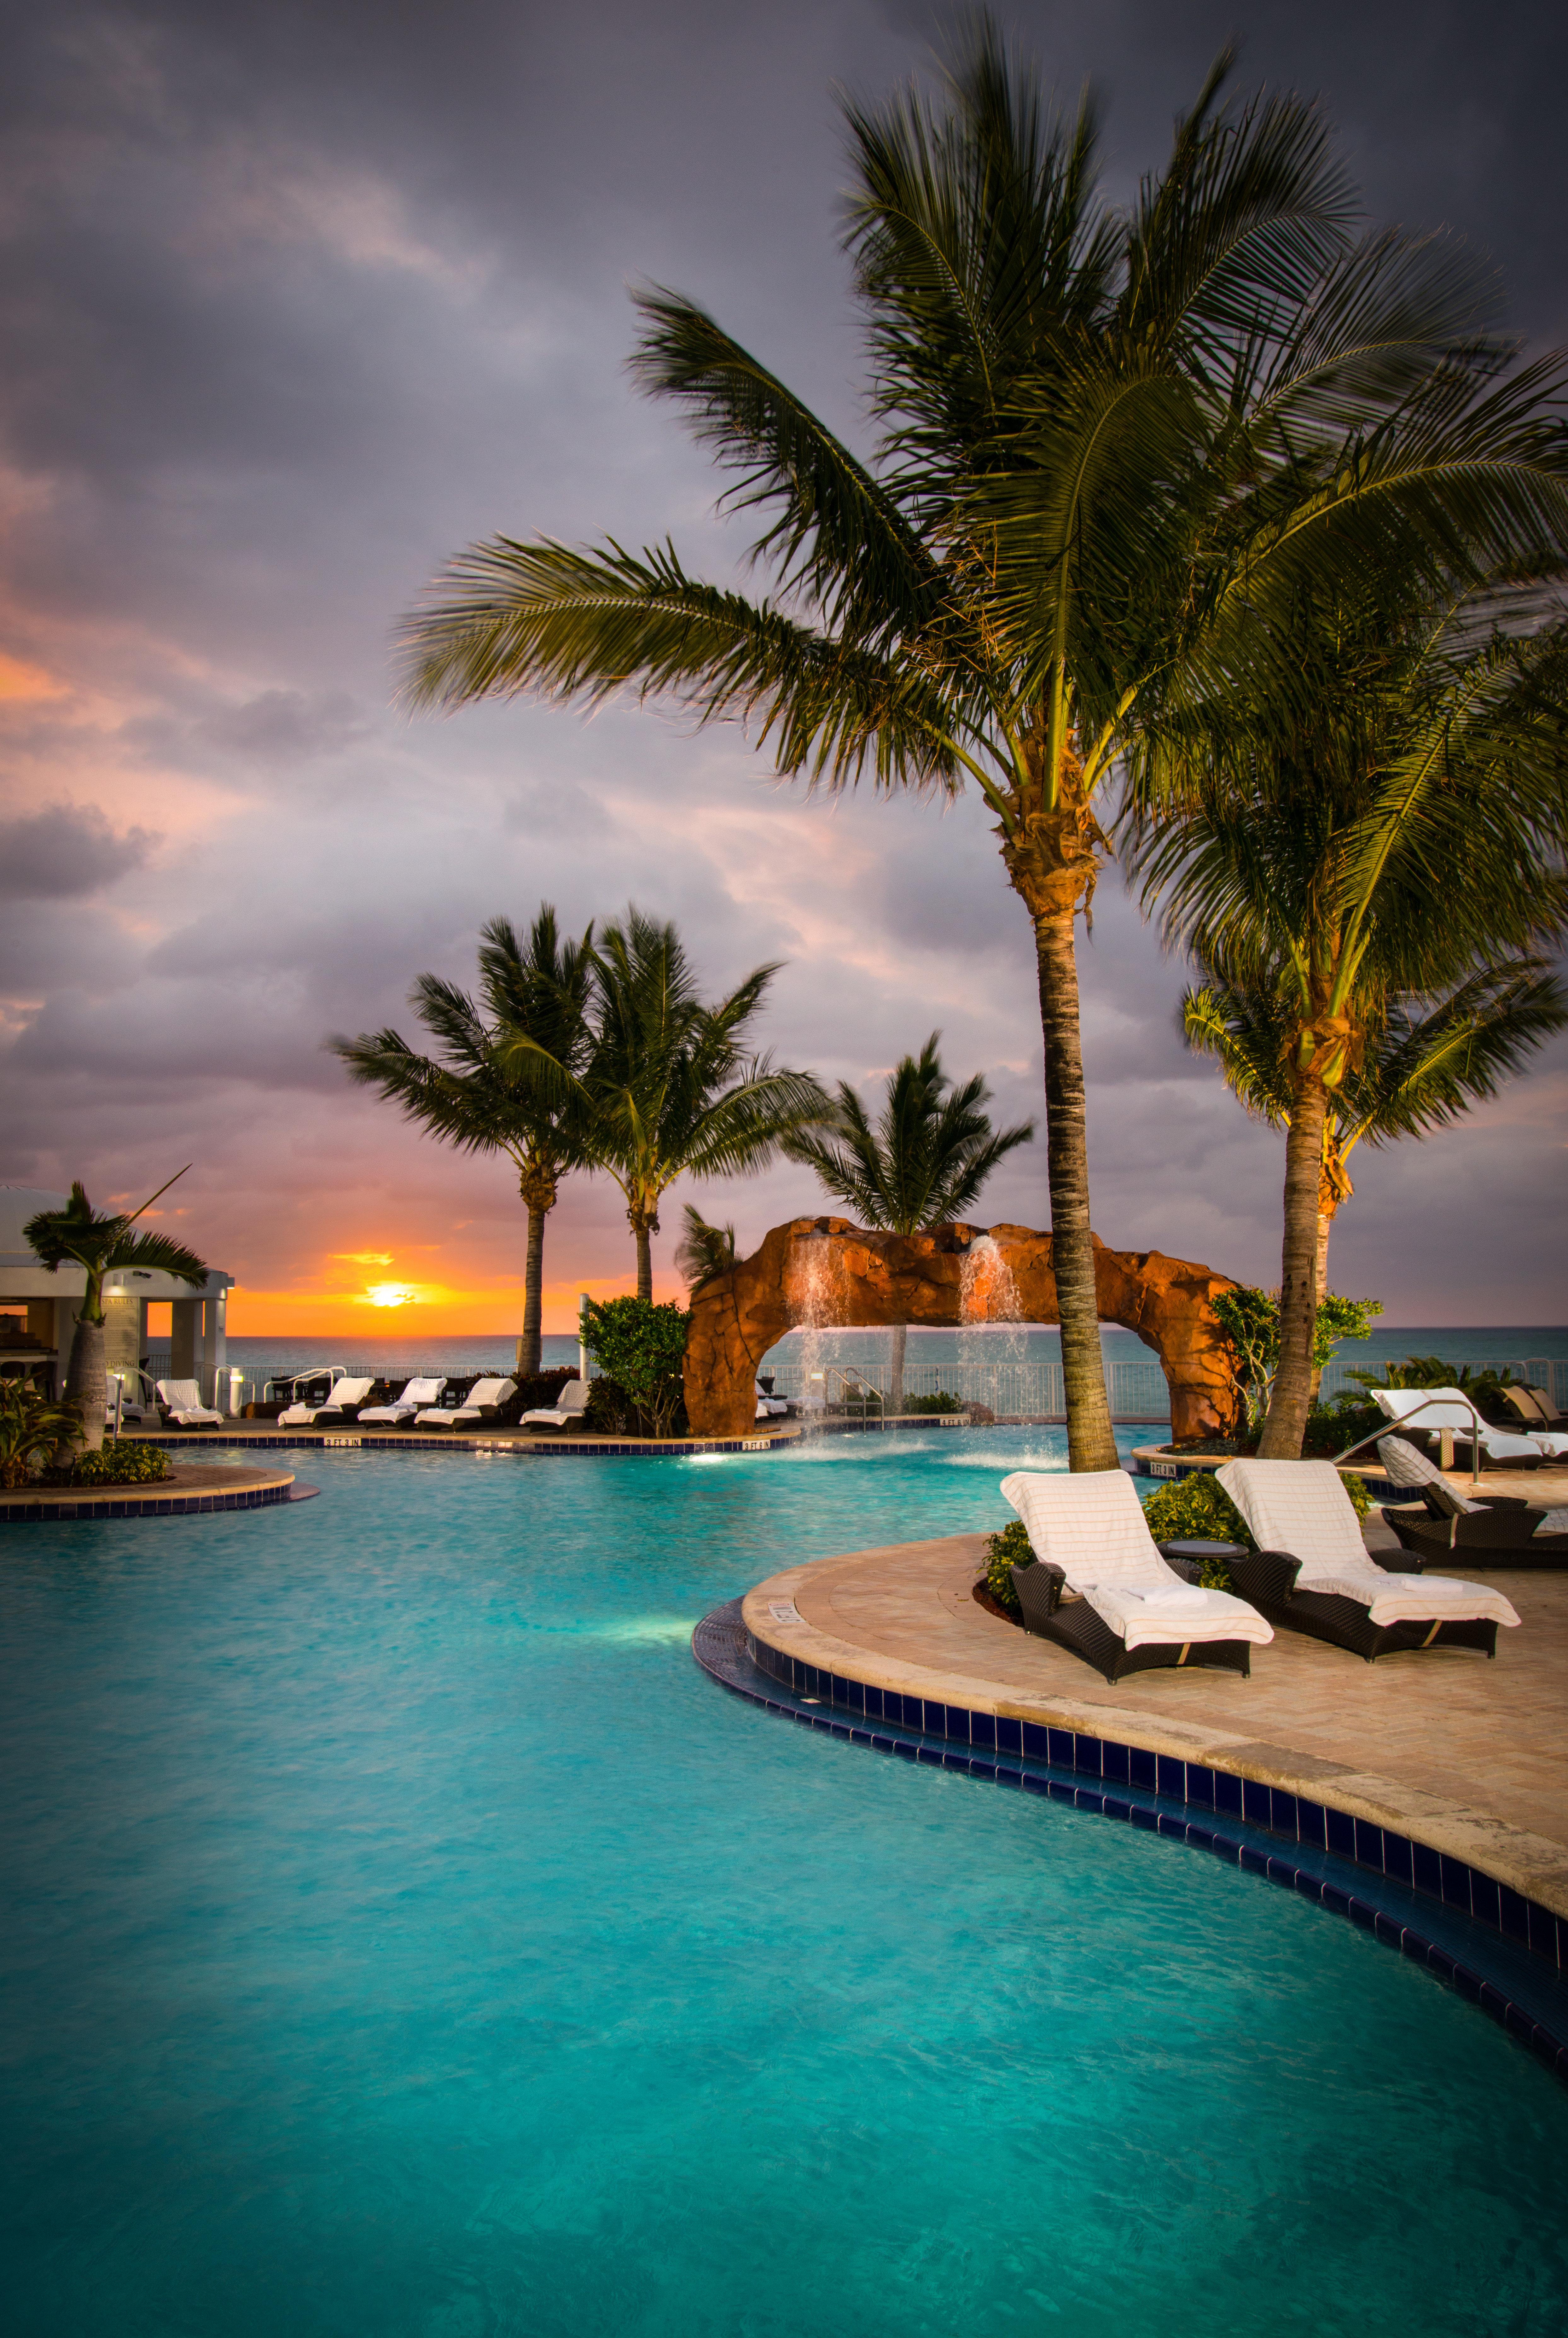 water tree Resort Sea Ocean swimming pool Beach caribbean arecales tropics palm family Coast Lagoon palm dusk Sunset lined surrounded Island